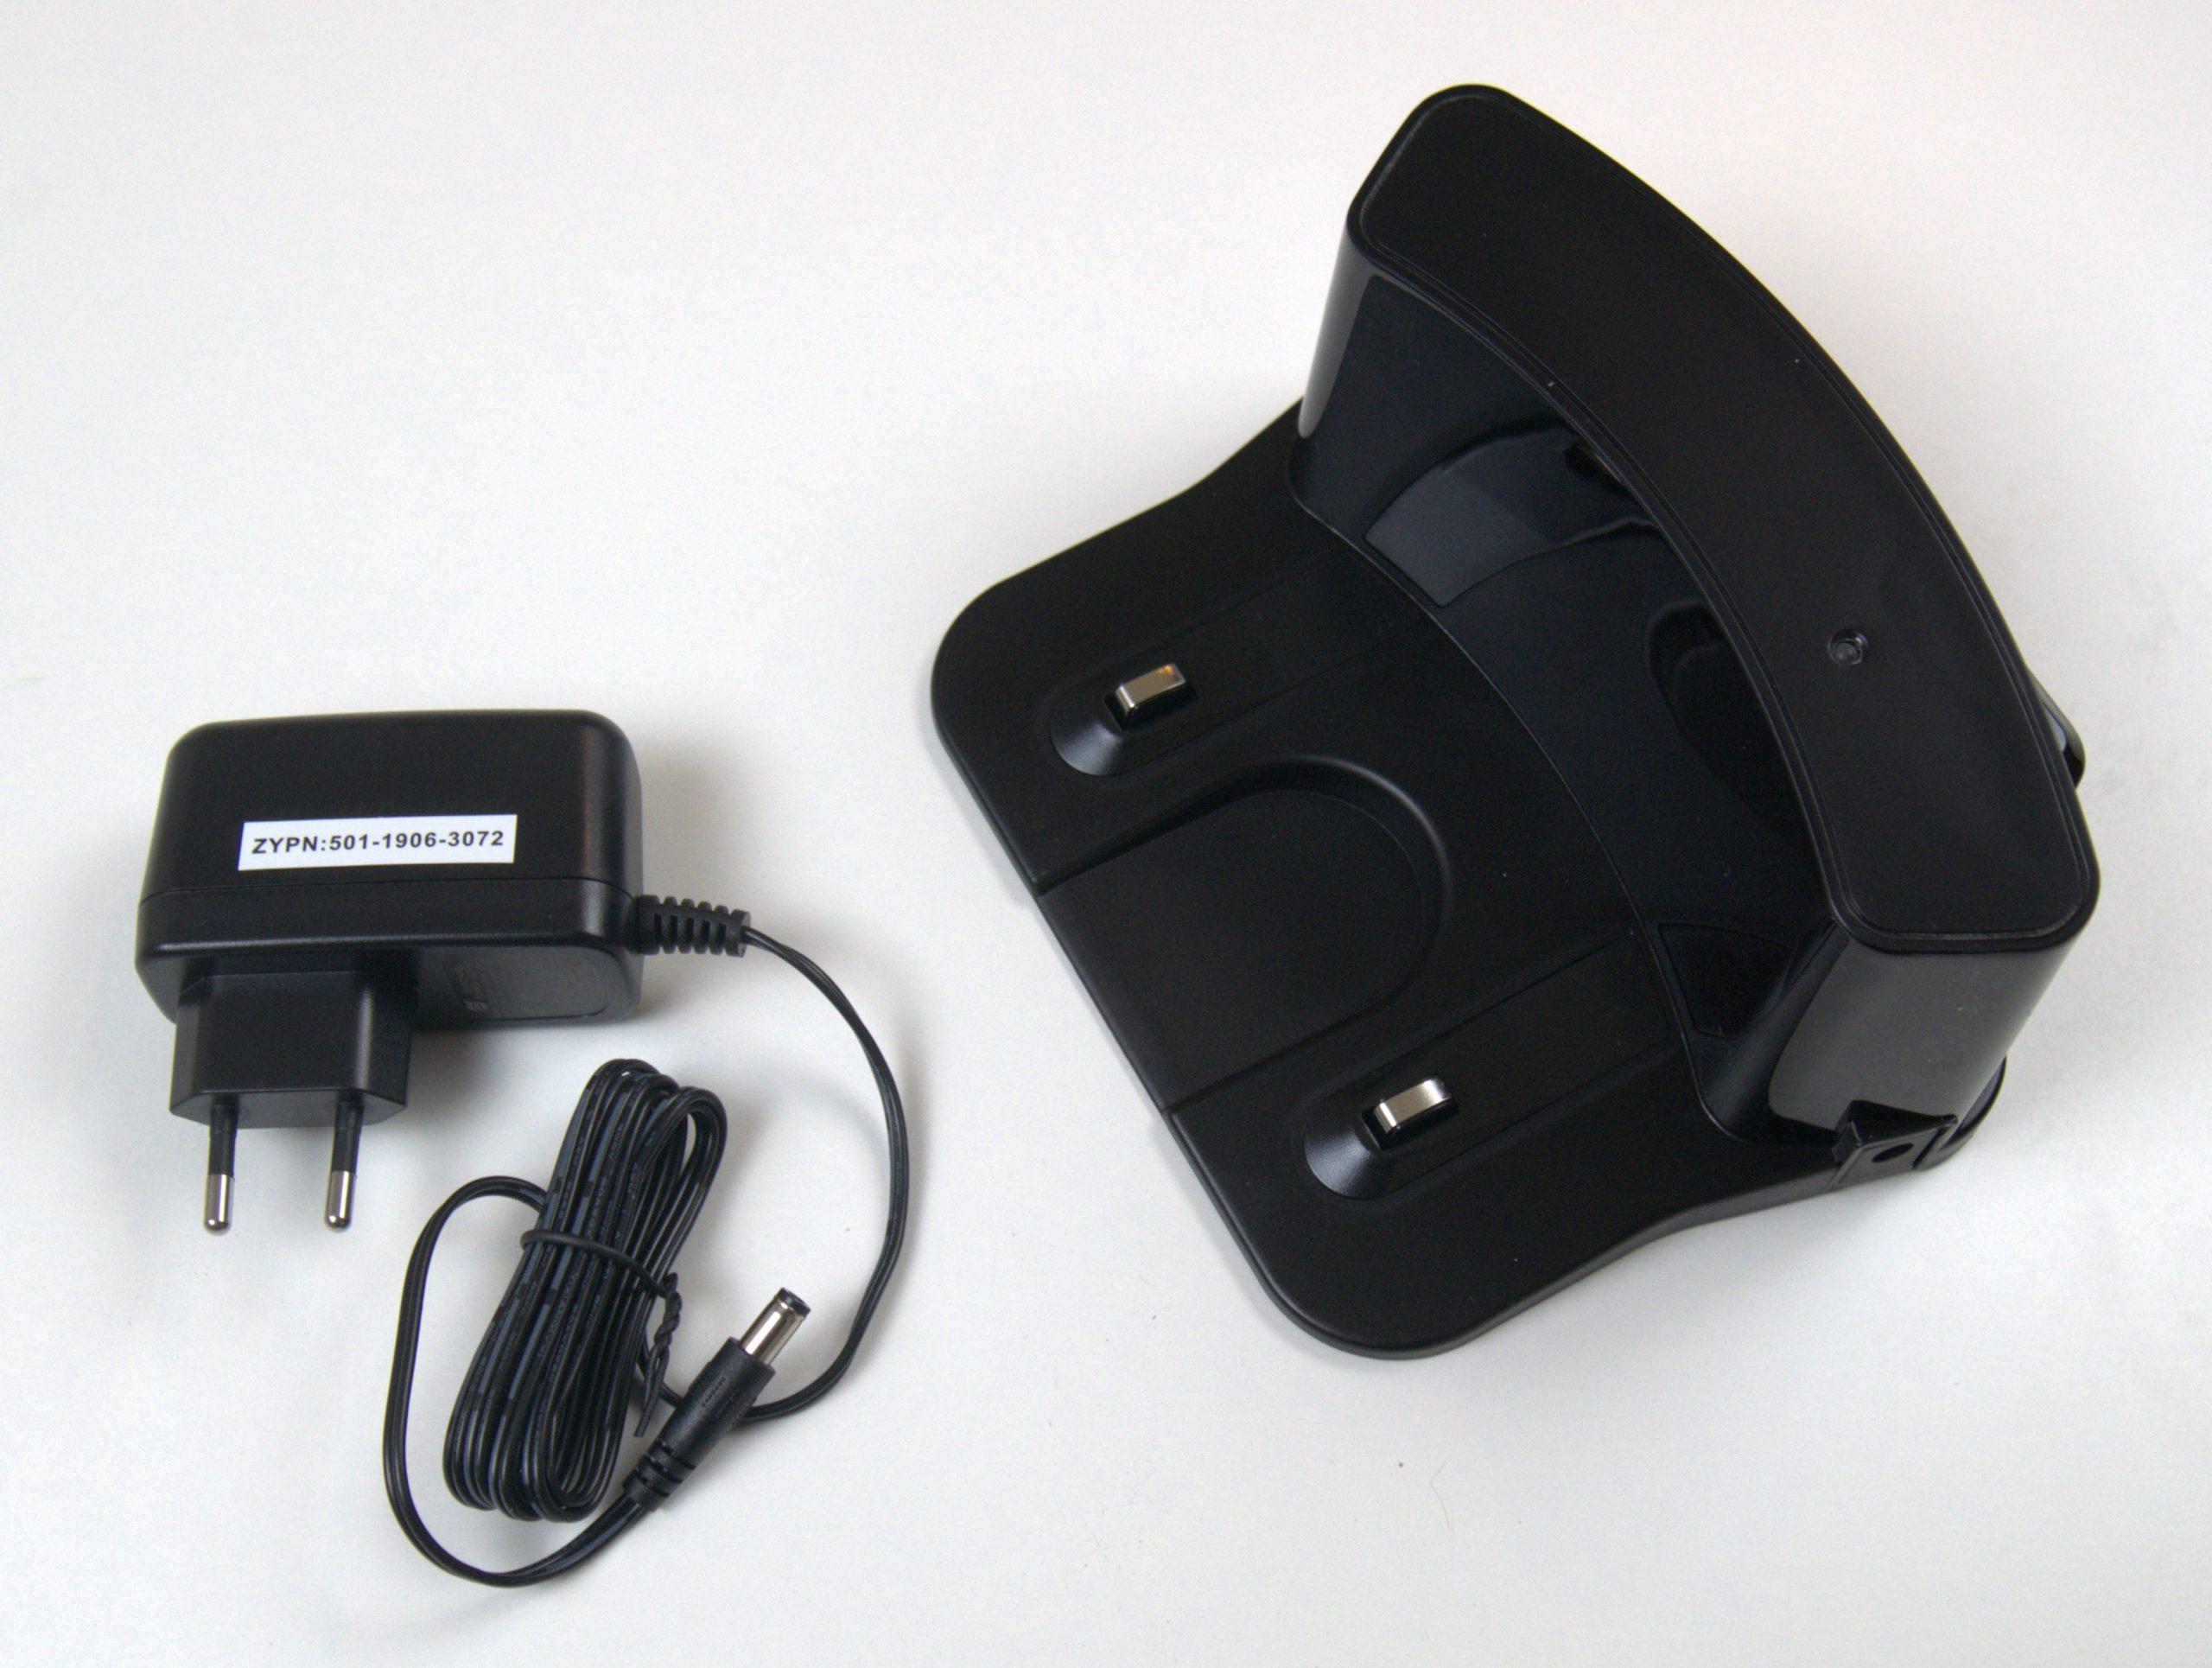 iBoto X320G Aqua база и адаптер